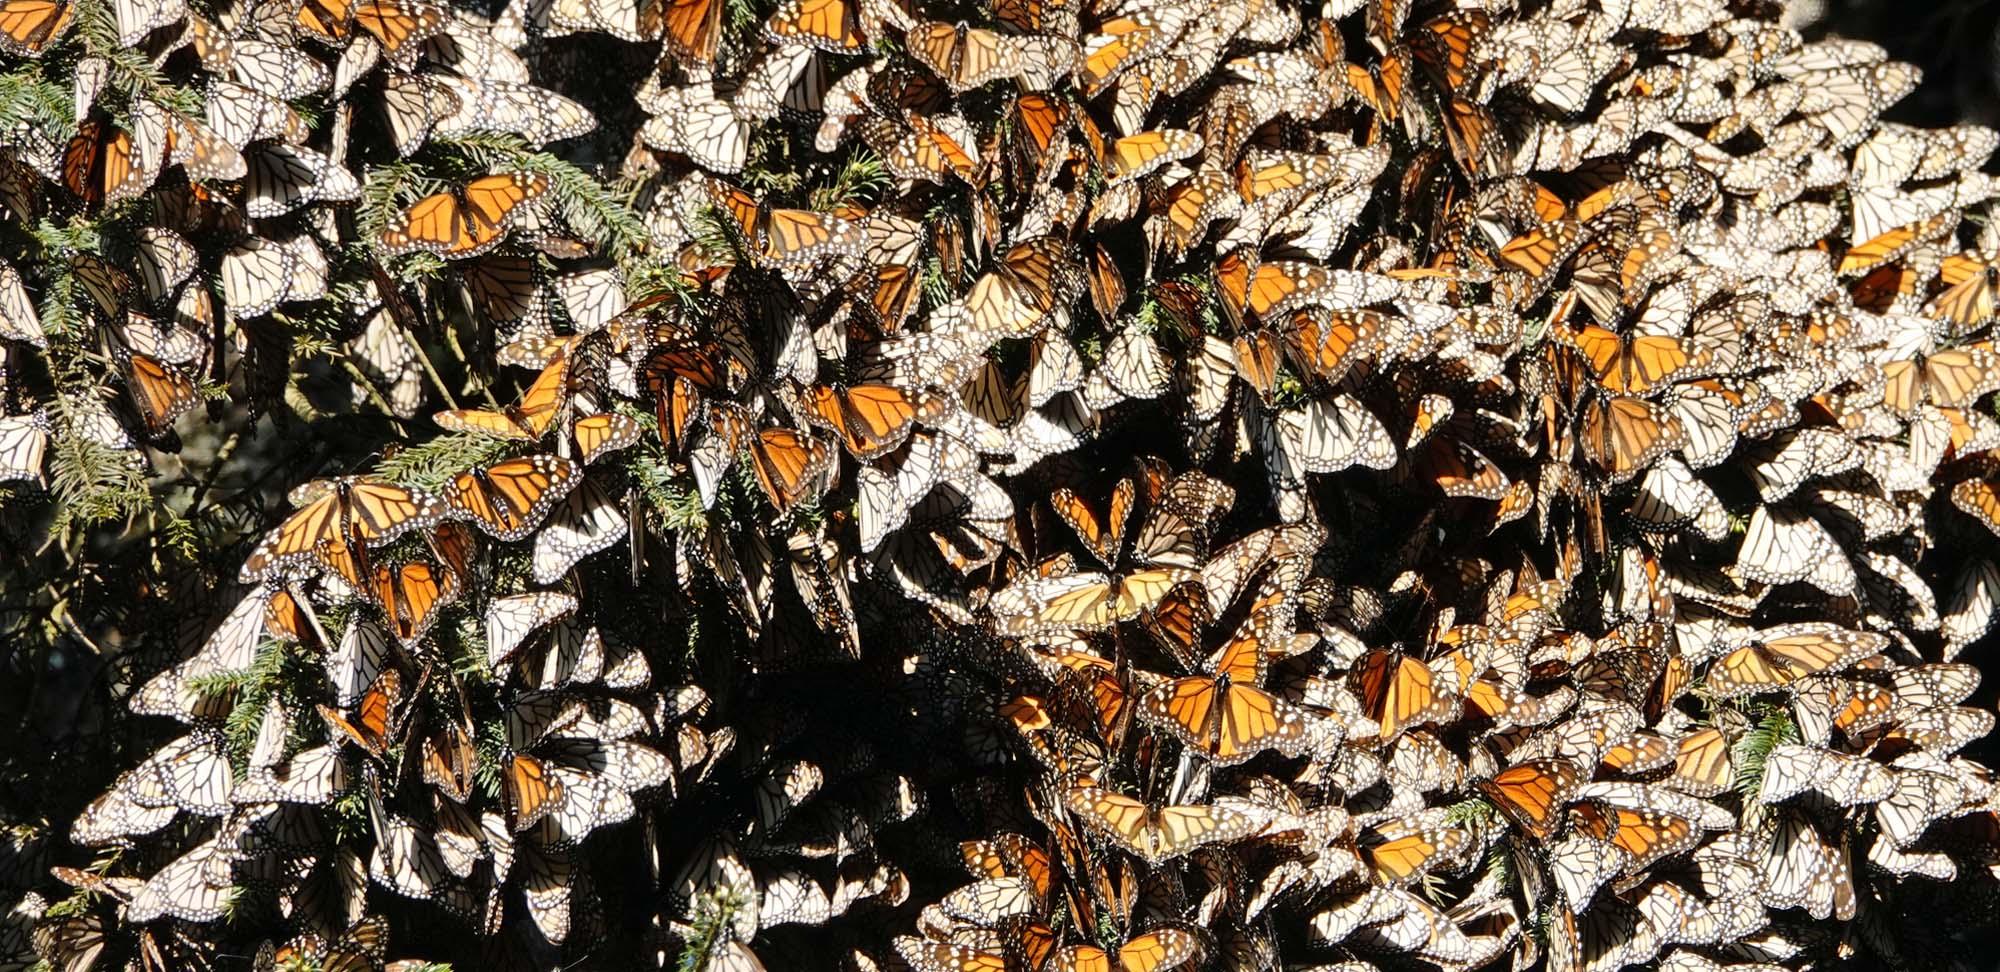 Monarchs Field Guides Birding Tours Mexico